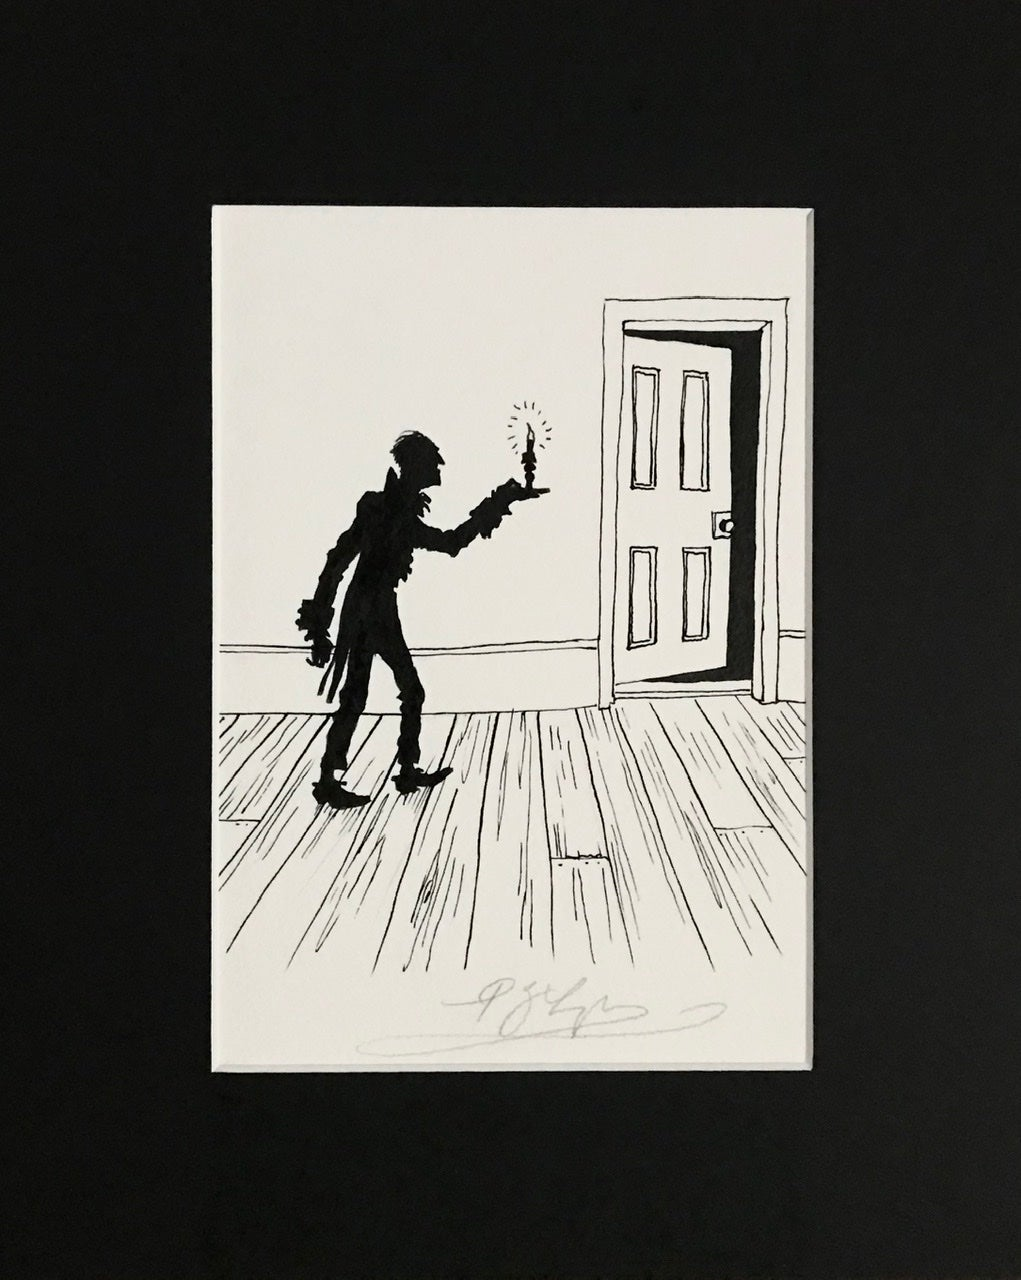 Image of Ebenezar Scrooge